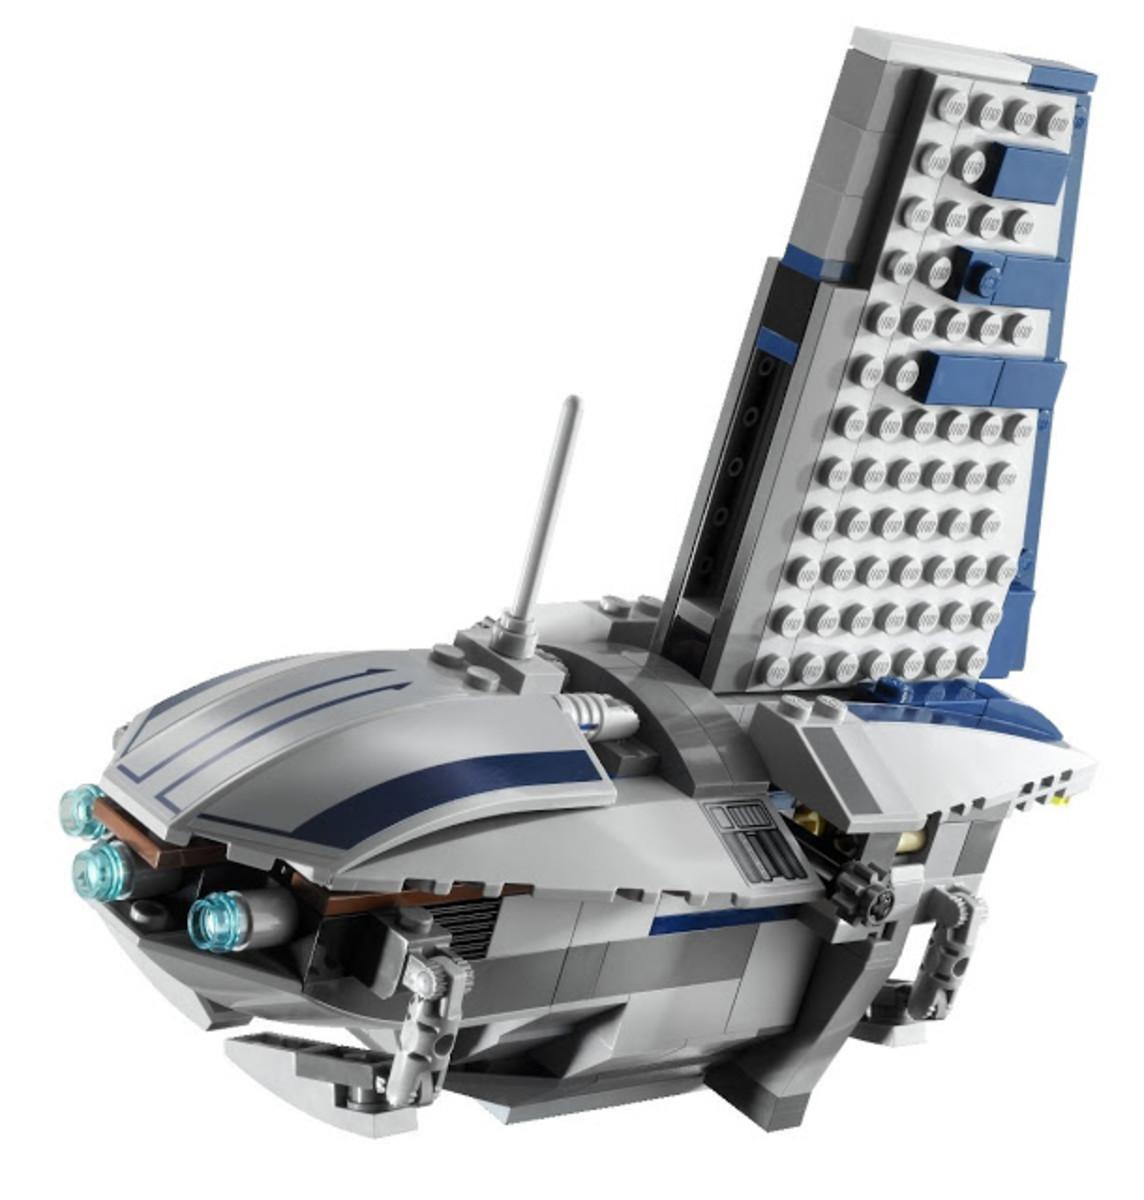 LEGO Star Wars Separatist Shuttle 8036 Assembled